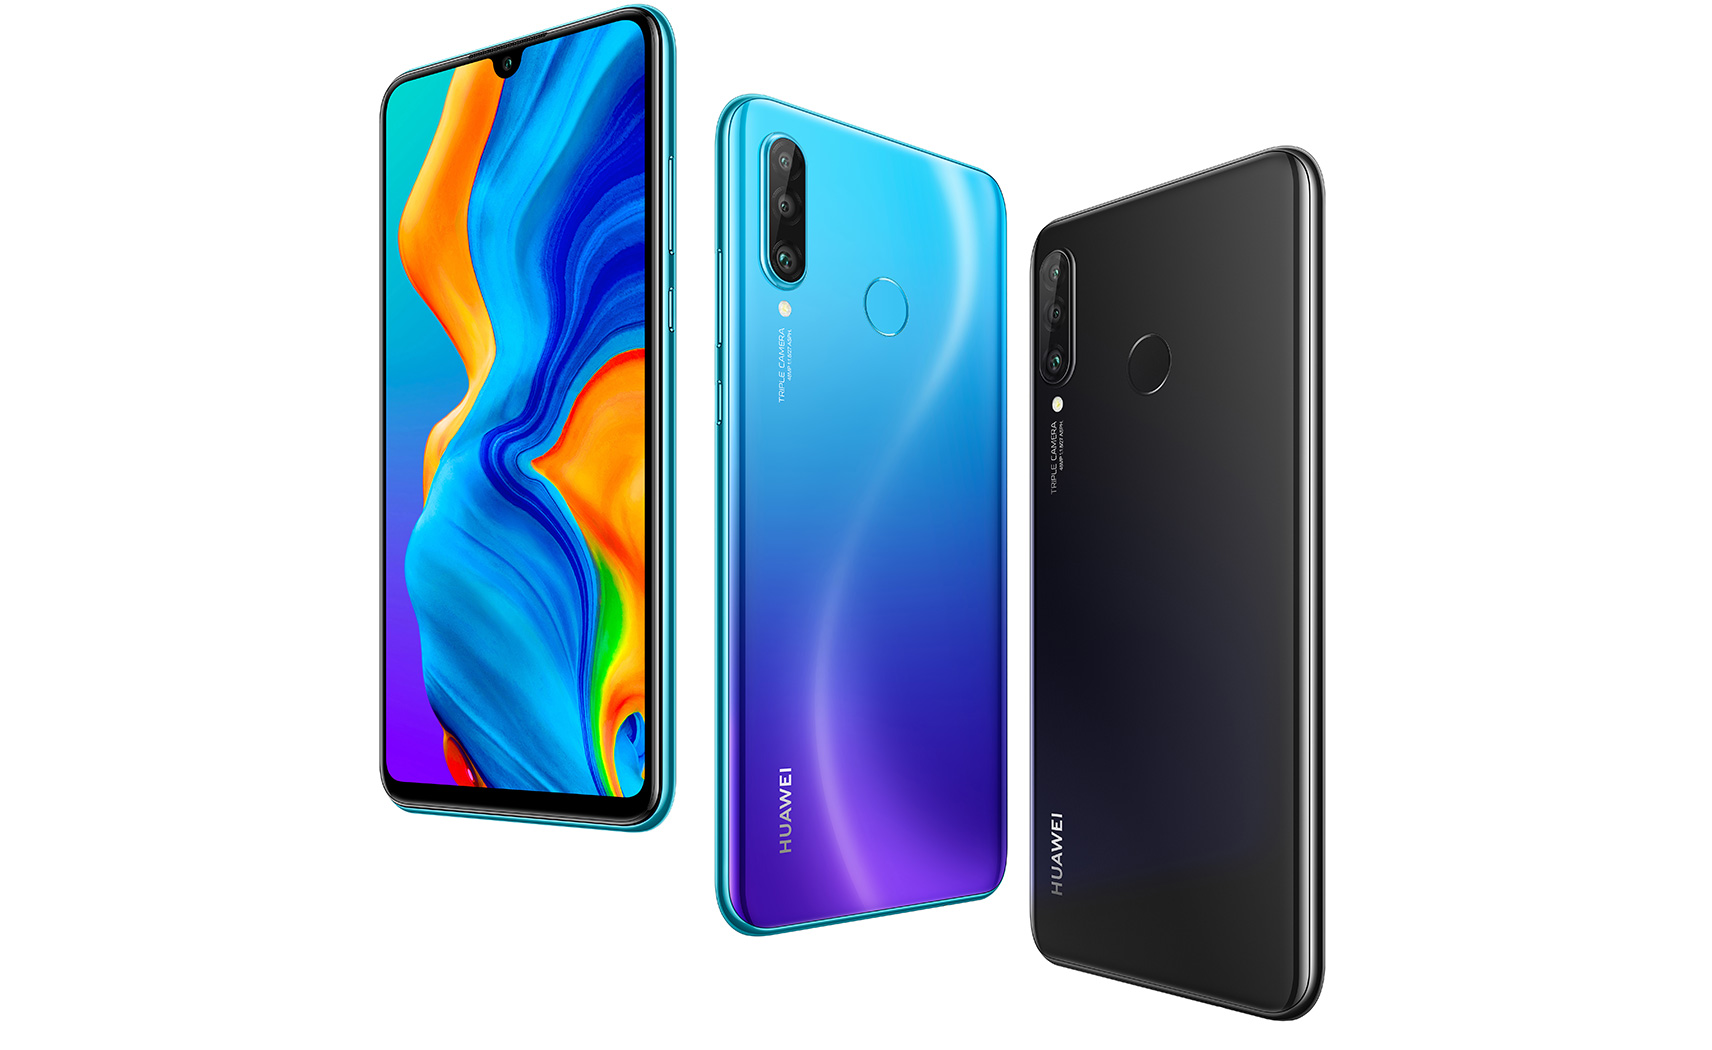 Soutěž o smartphone Huawei P30 Lite s výborným 48Mpx fotoaparátem - https://mobilenet.cz/clanky/vyhrajte-huawei-p30-lite-38411